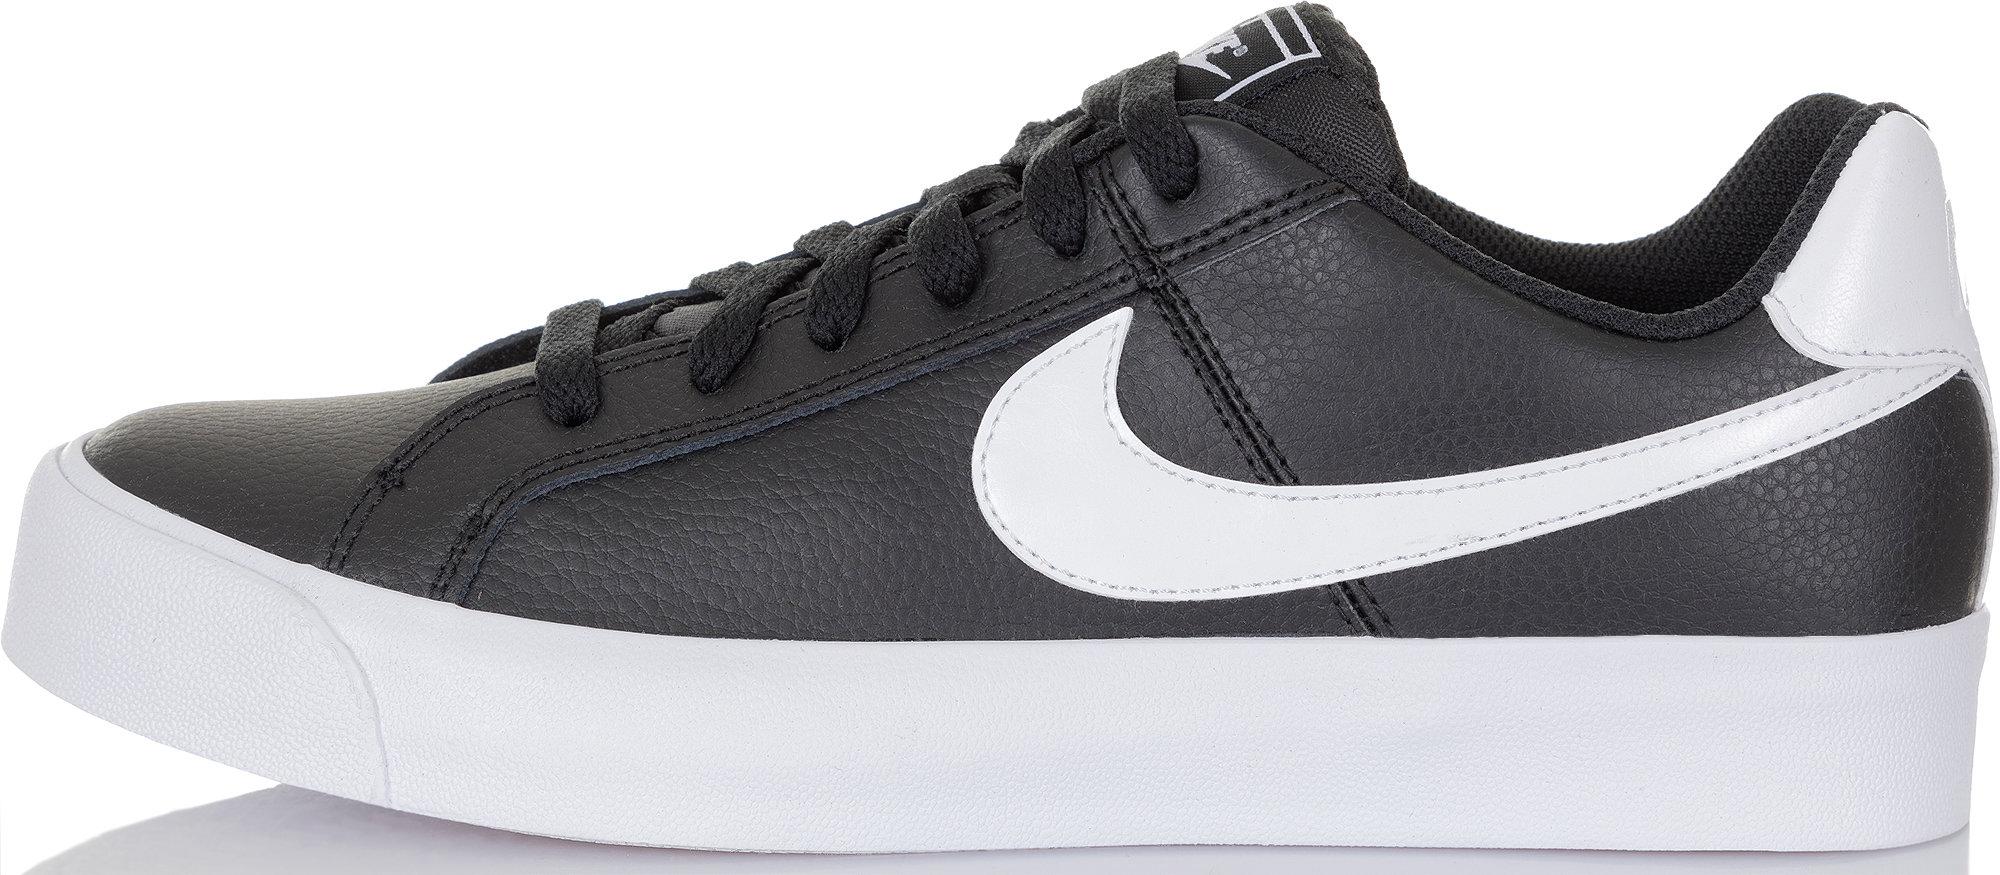 Кеды женские Nike Court Royale AC, размер 35,5